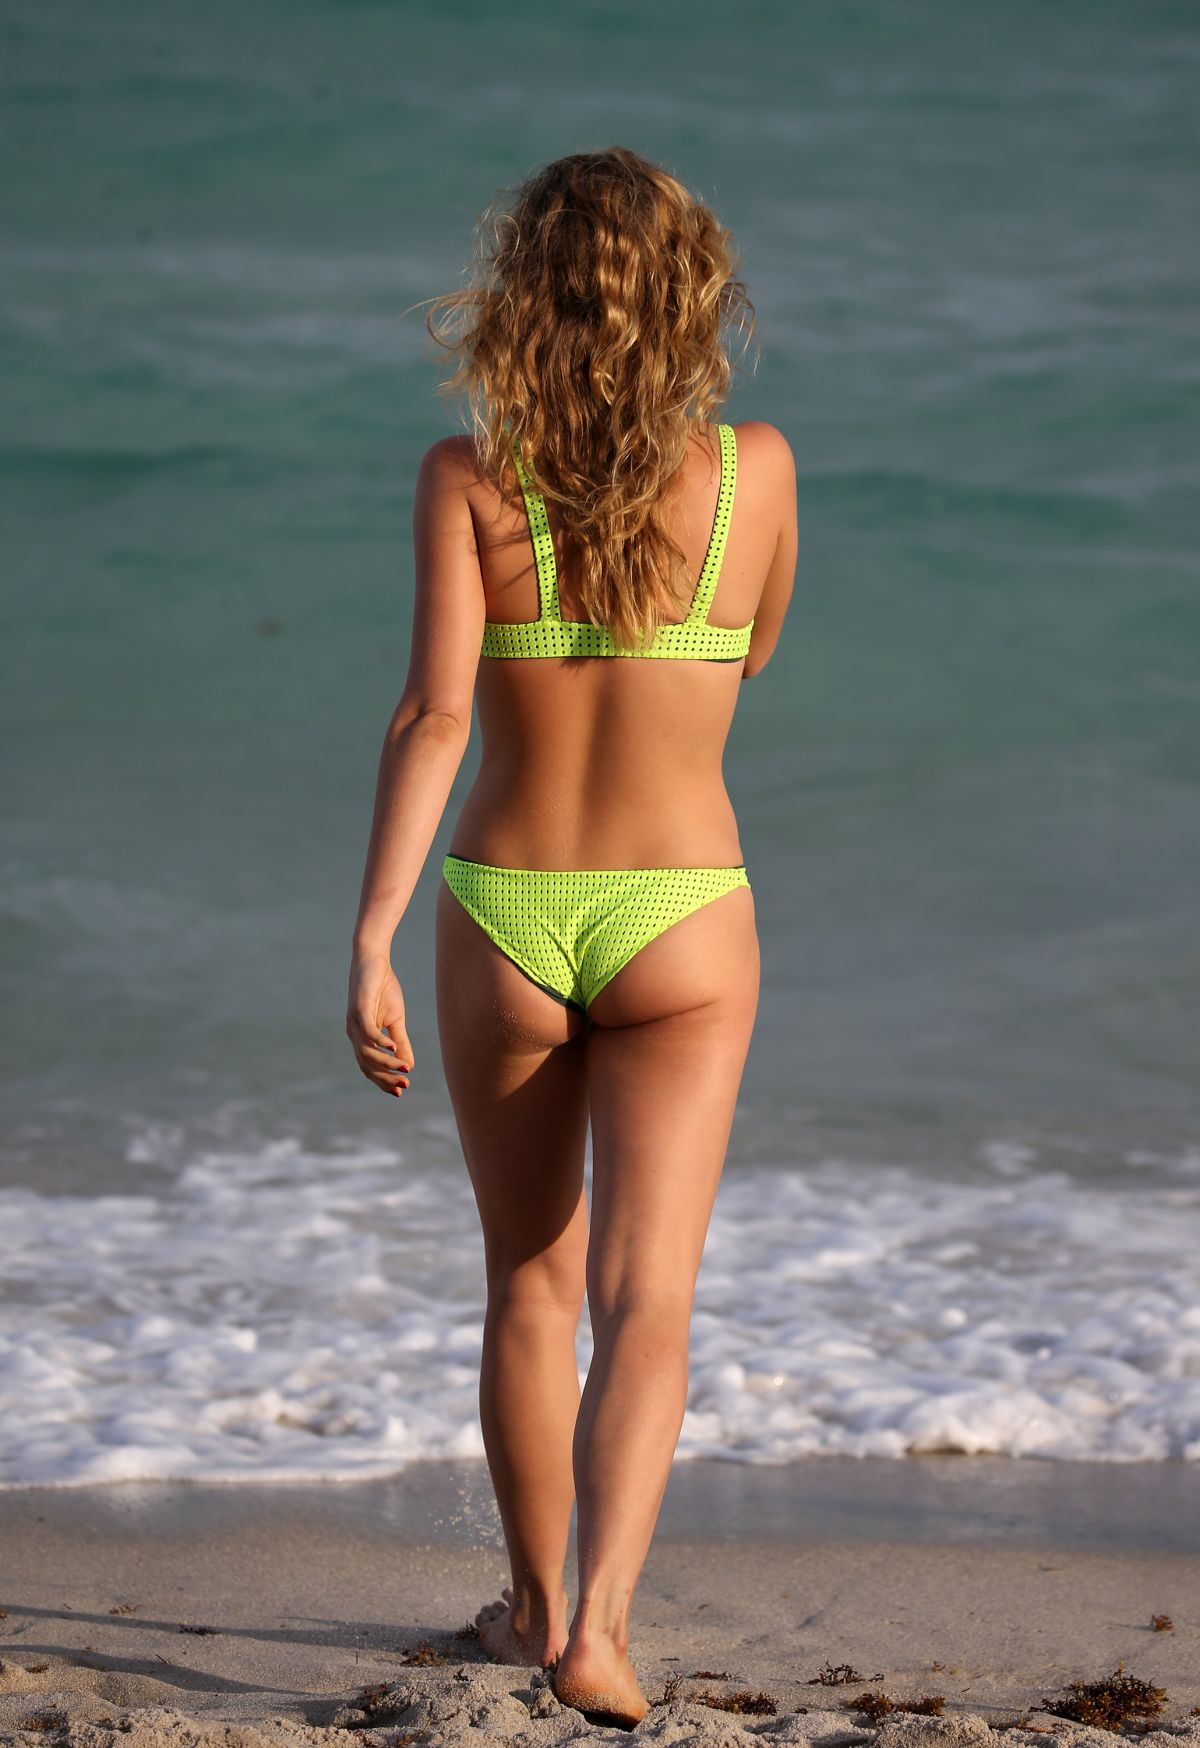 Sailor Brinkley-Cook Bikini Nude Photos 92